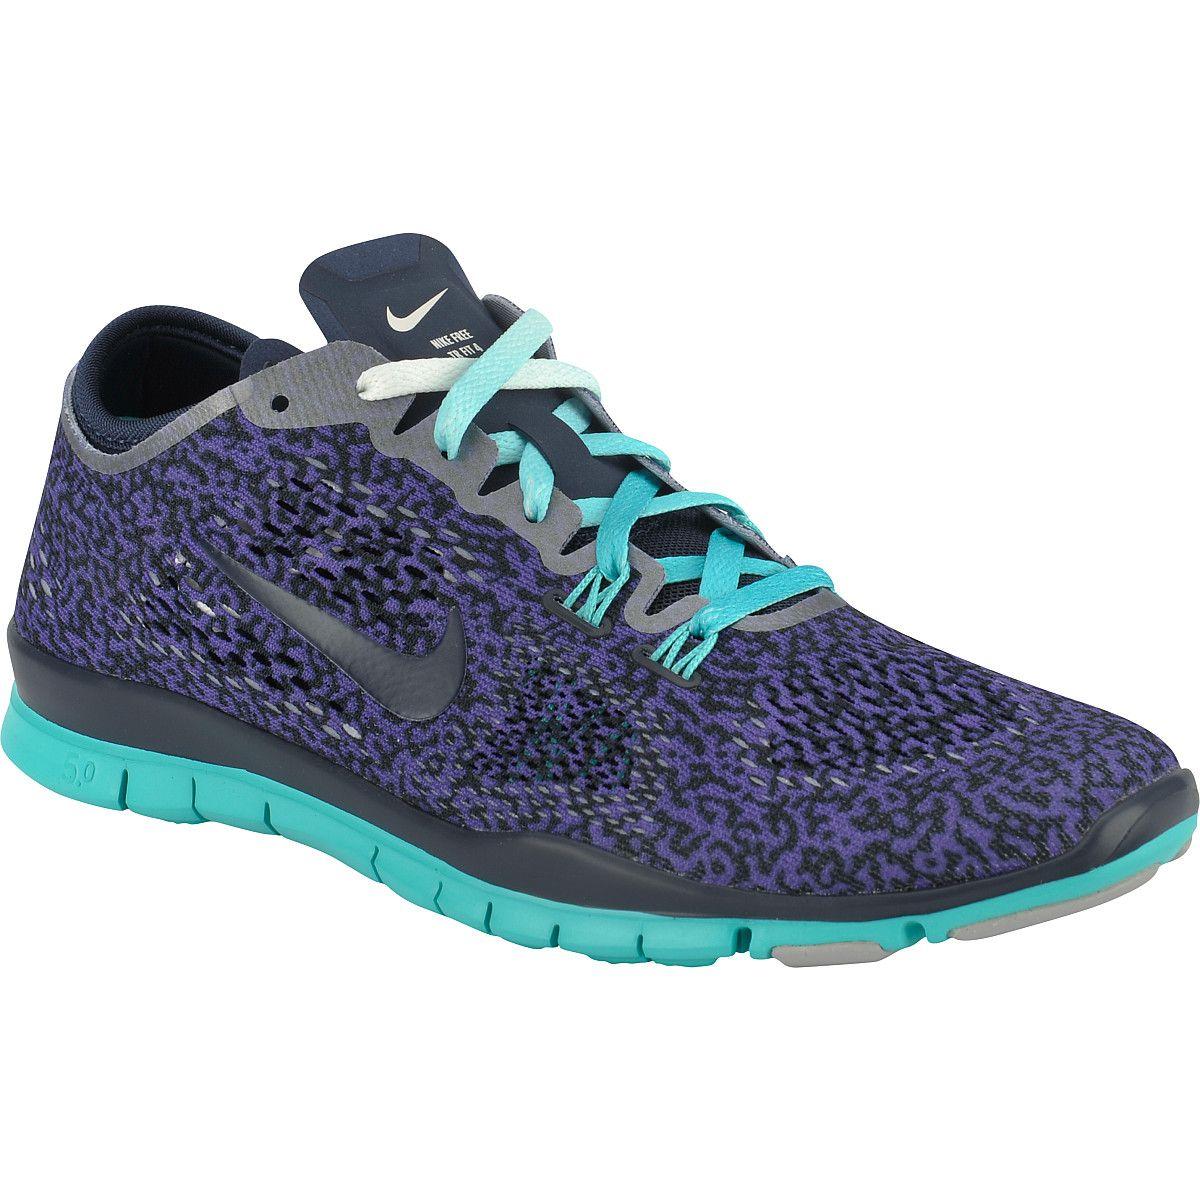 NIKE Women's Free 5.0 TR Fit 4 Print CrossTraining Shoes